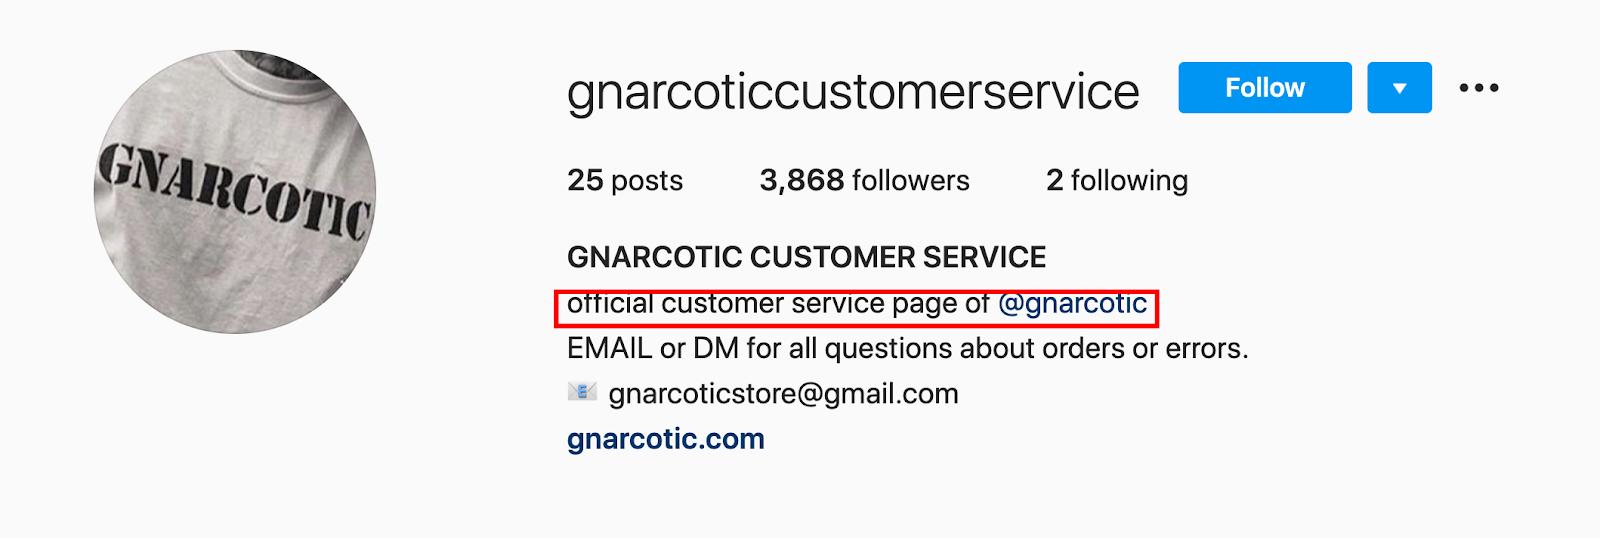 Gnarcotic-instagram-customer-service